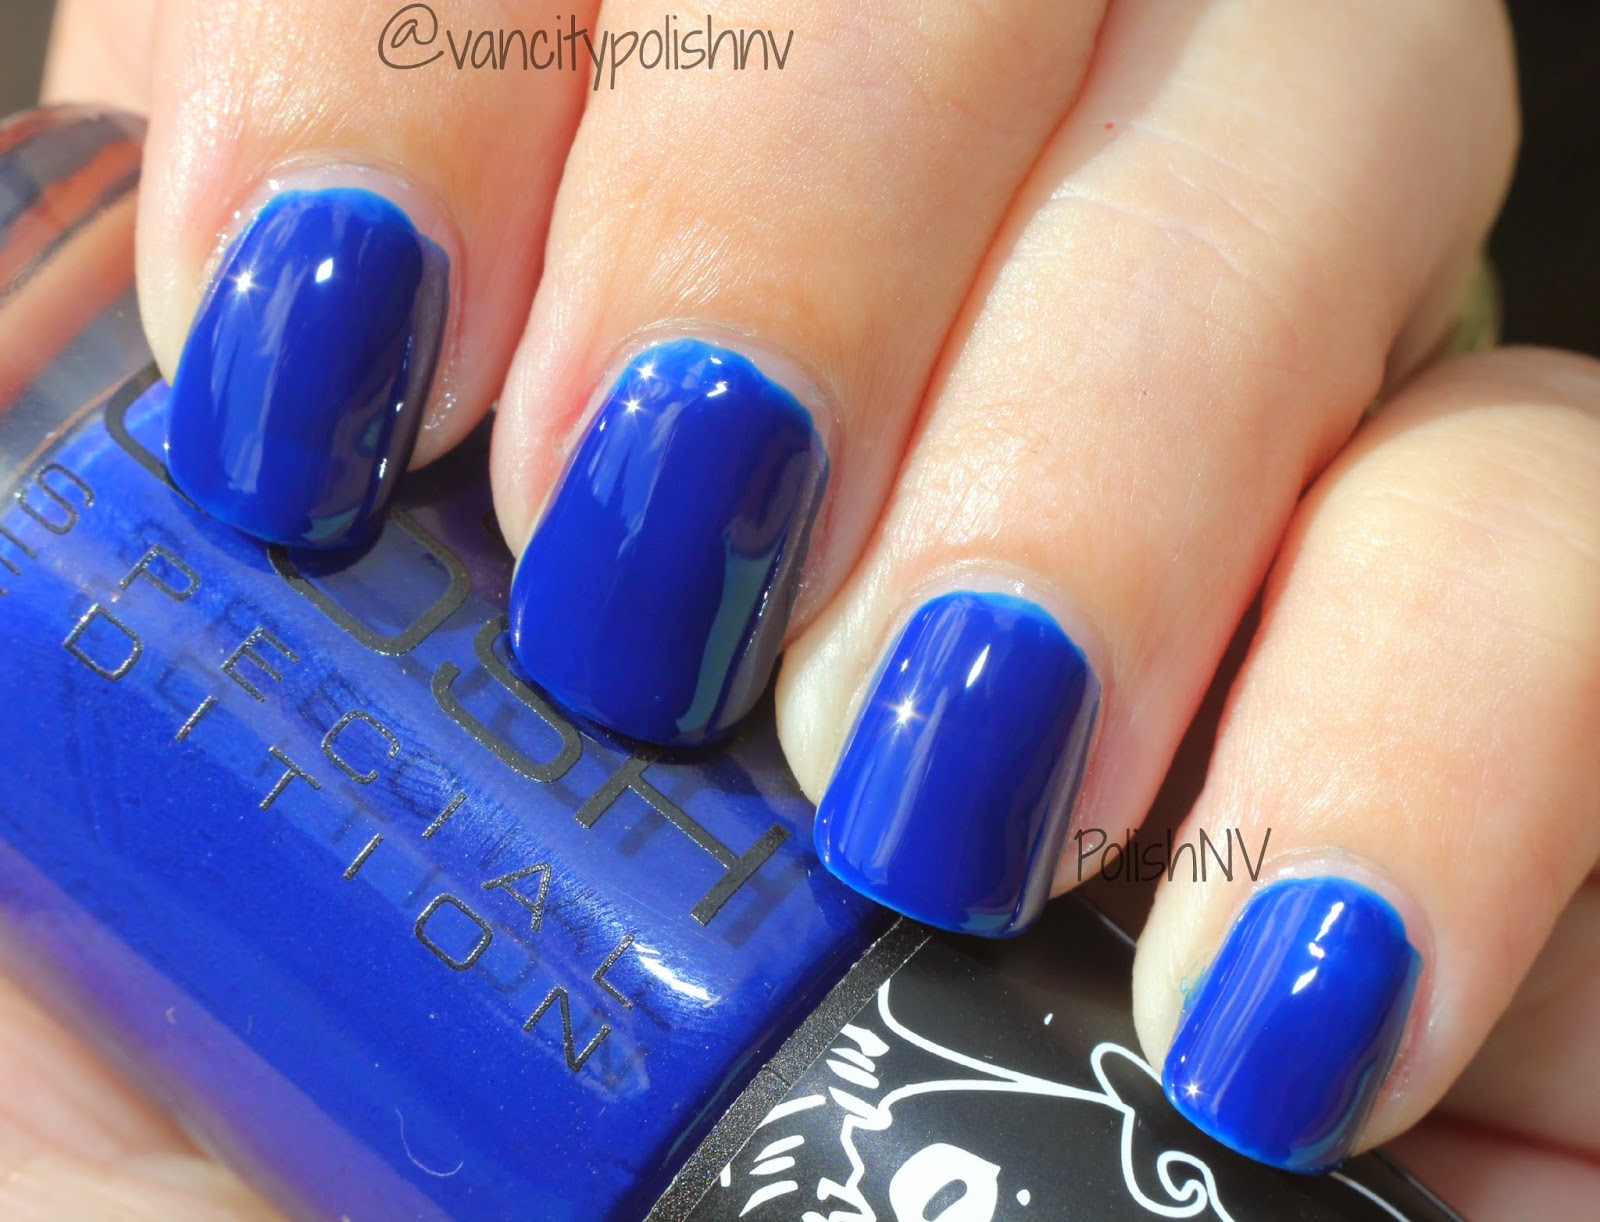 Gosh nail polish Attitude